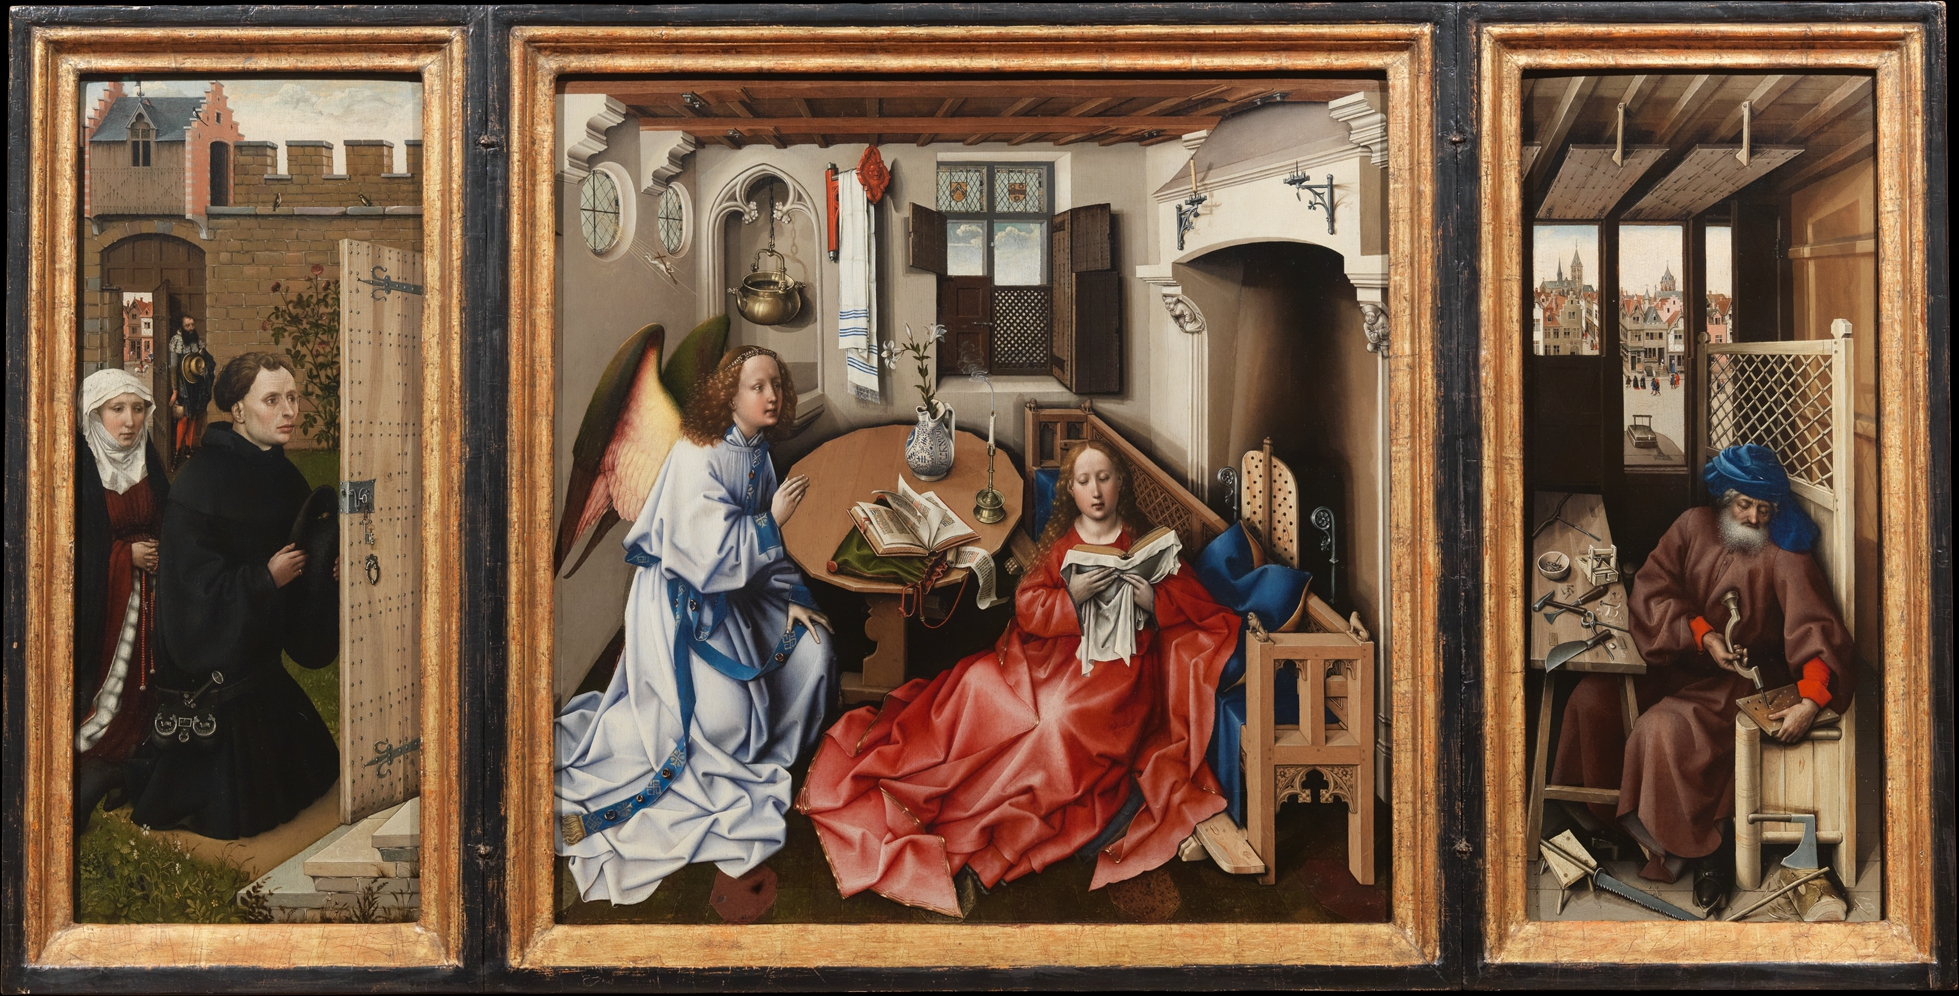 "Robert Campin, Merode Altarpiece  (open), ca. 1425-1428. Oil on wood, center panel 2'1 3/8"" x 2' 7/8"", each wing 2' 1 3/8"" x 10 7/8"", Metropolitan Museum of Art, New York"